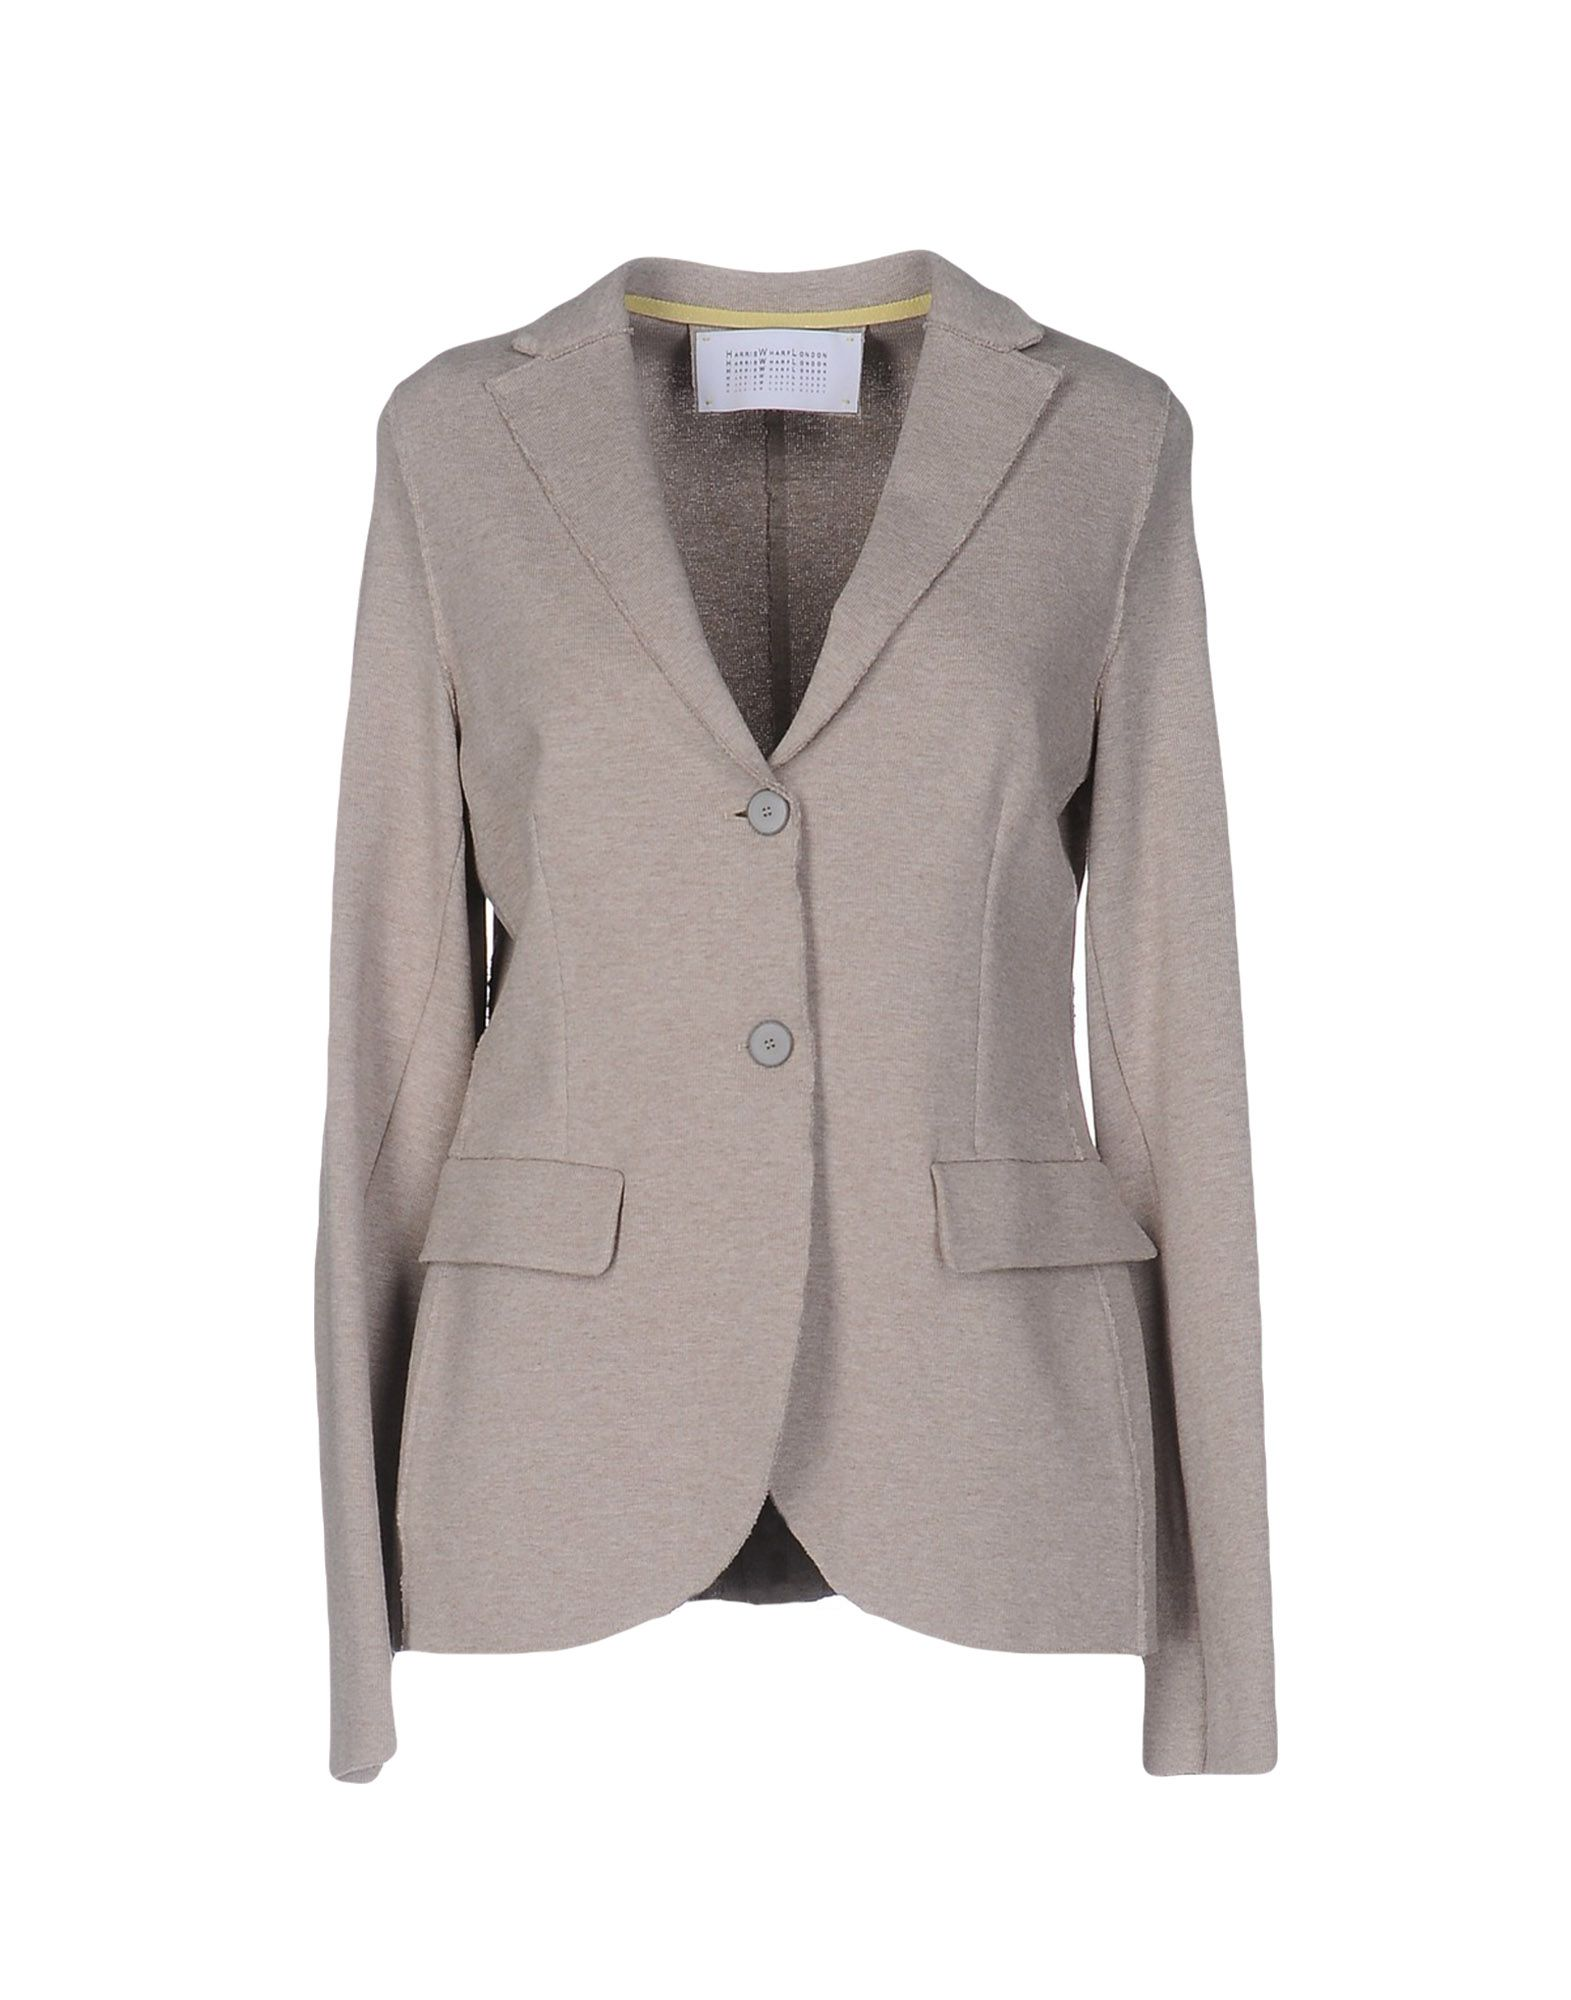 HARRIS WHARF LONDON Damen Jackett Farbe Beige Größe 5